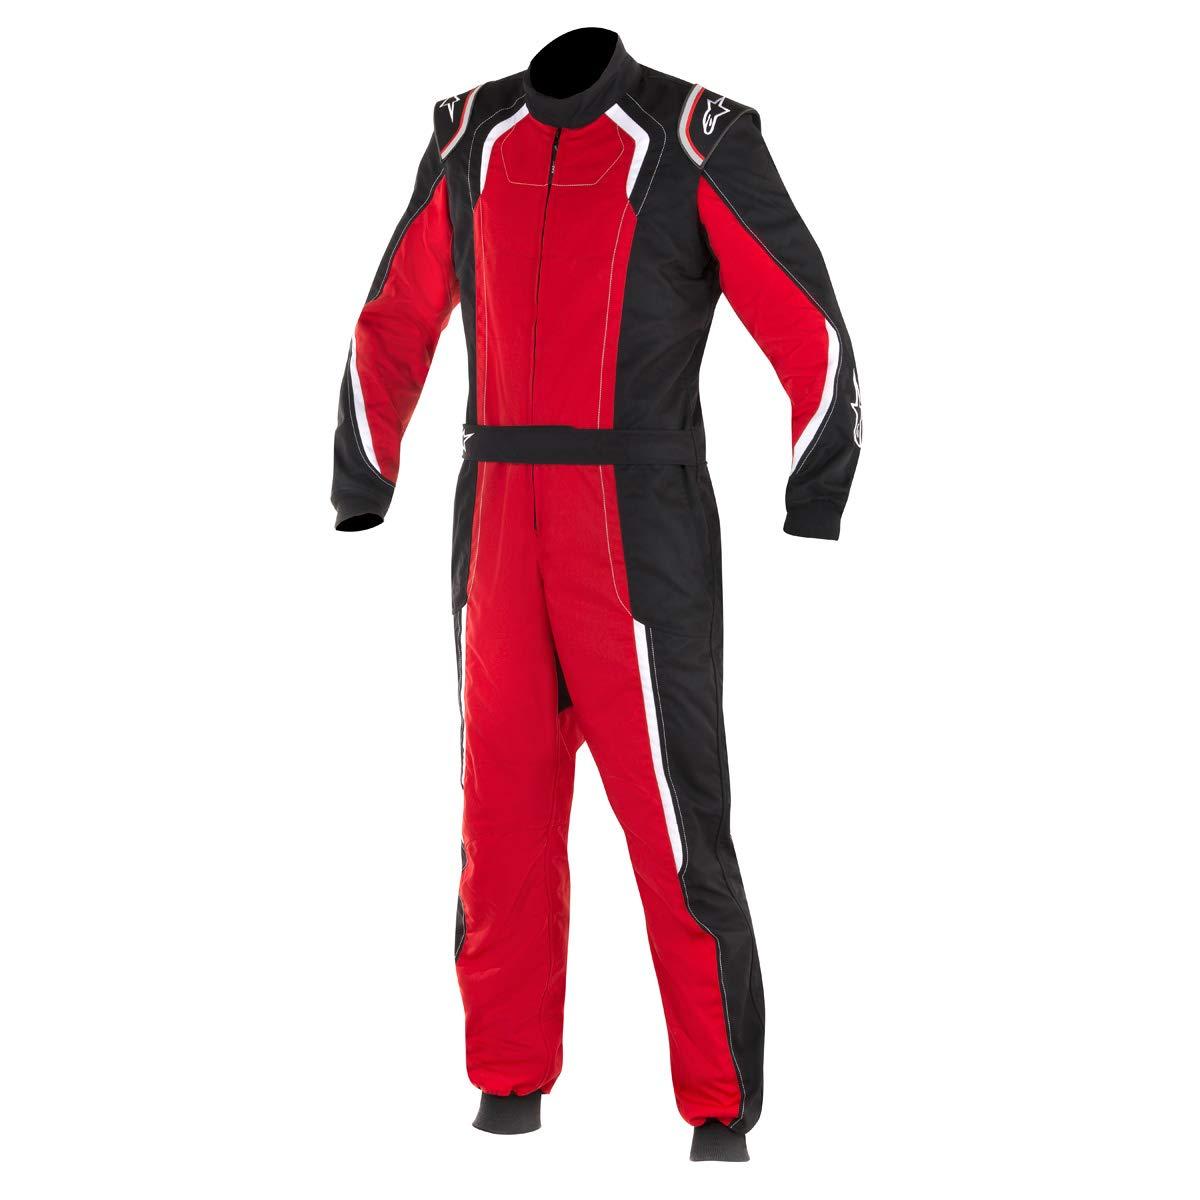 Alpinestars 3353017-132-50 K-MX 5 Suit, Black/Red/White, Size 50, CIK FIA Level 2, 2-Layer